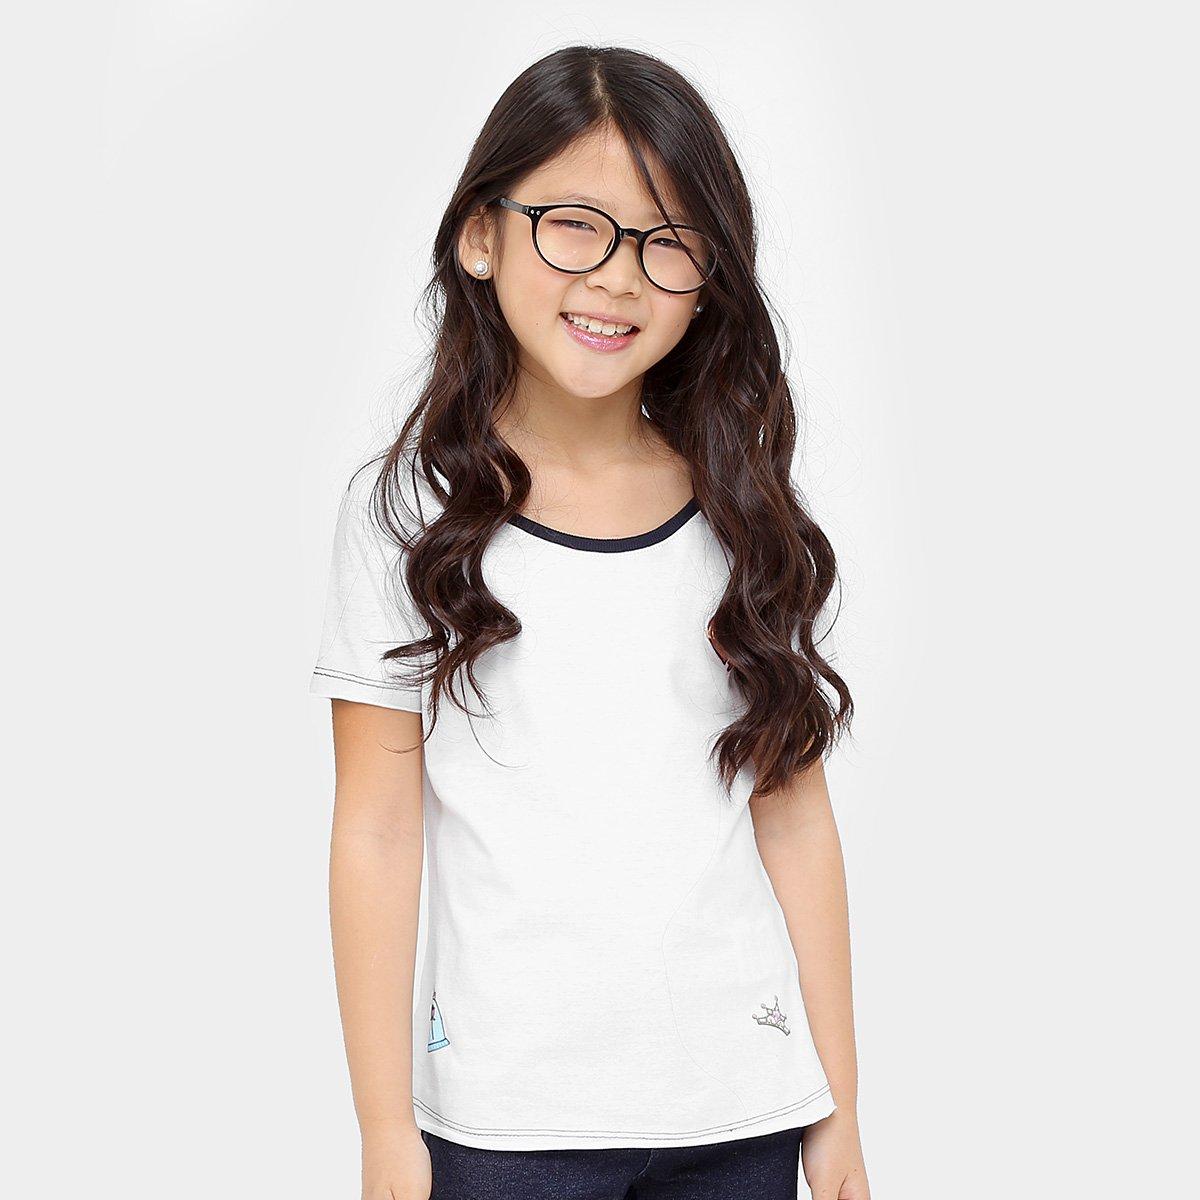 Branco Camiseta Botons Disney Bela Disney Camiseta Infantil xYzqUw7